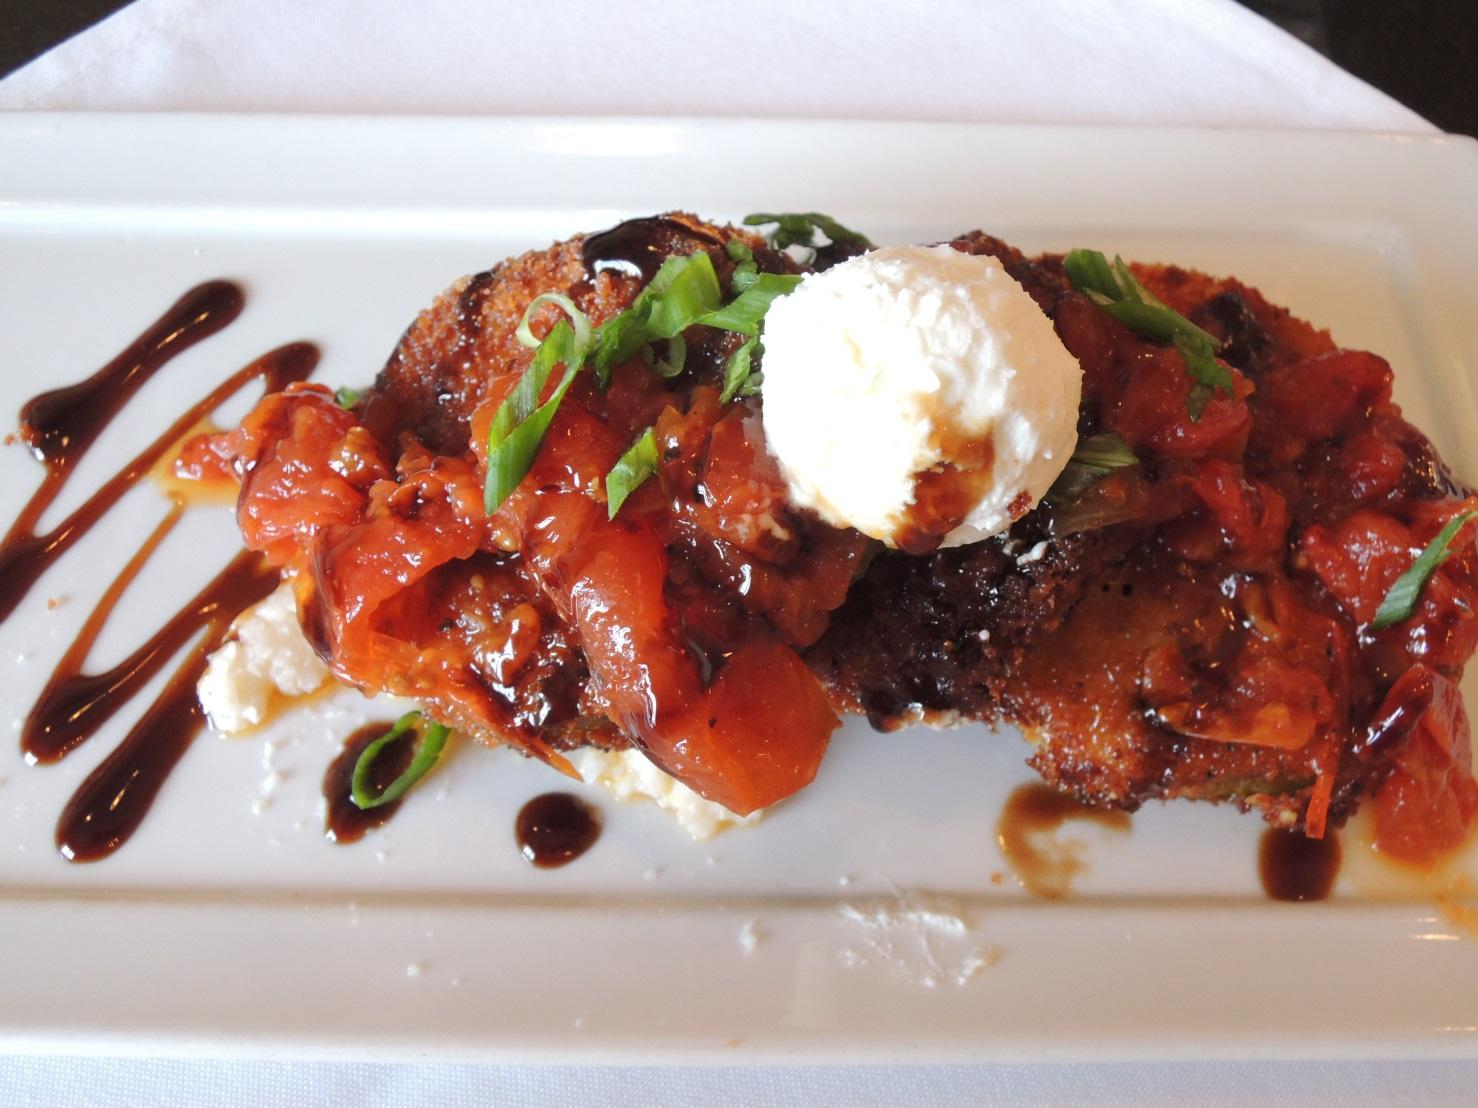 Fried Green Tomatoes in Savannah, GA - The Wayfaring Hedonist